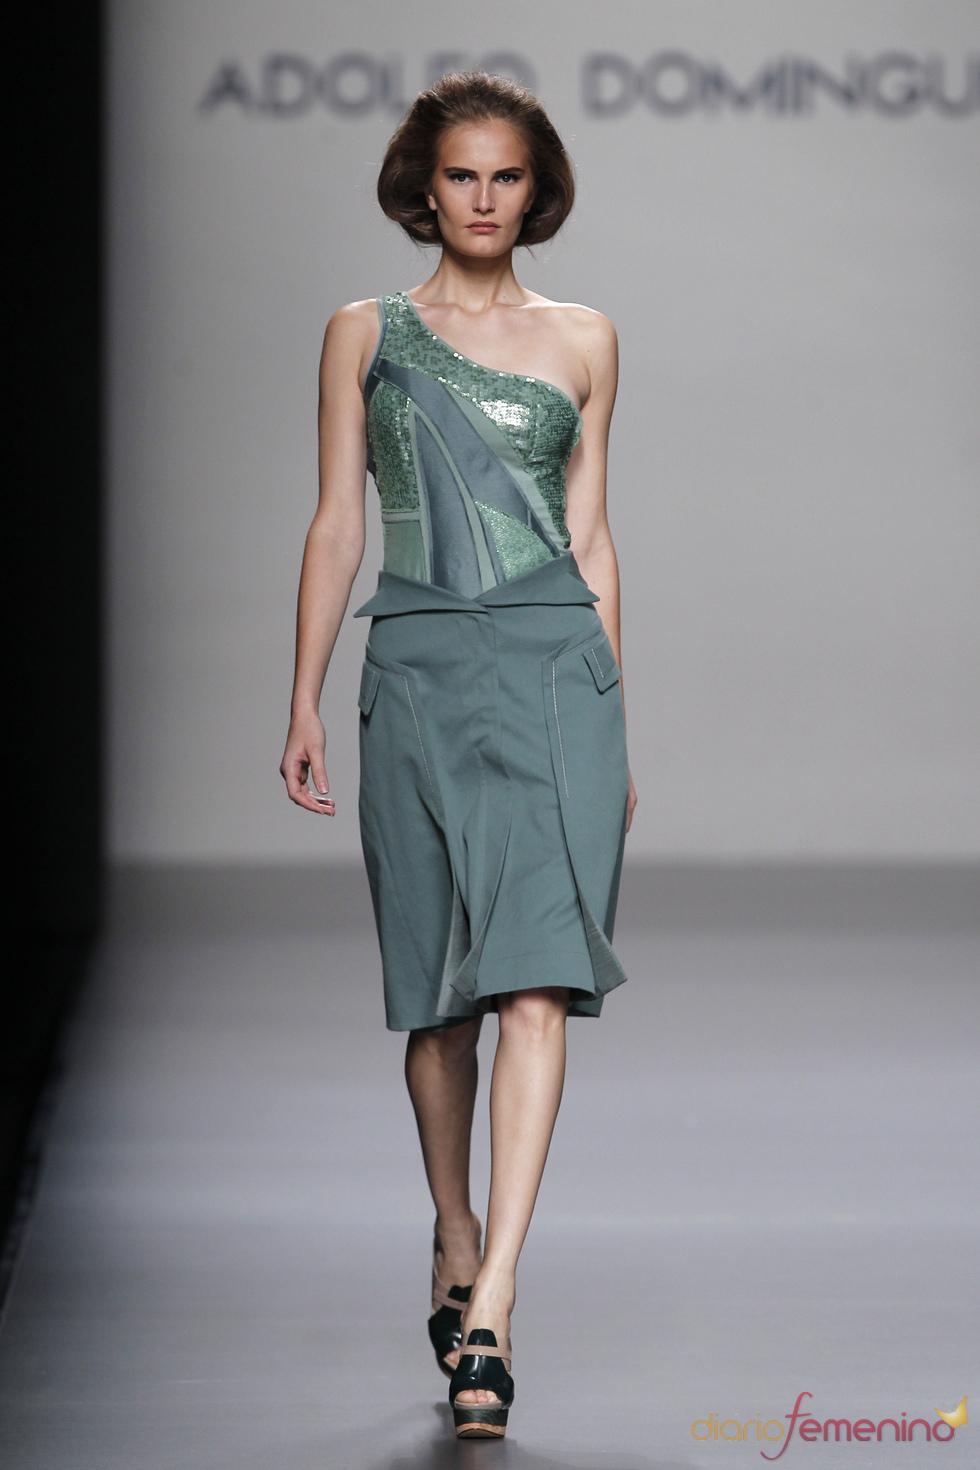 La elegancia femenina según Adolfo Domínguez